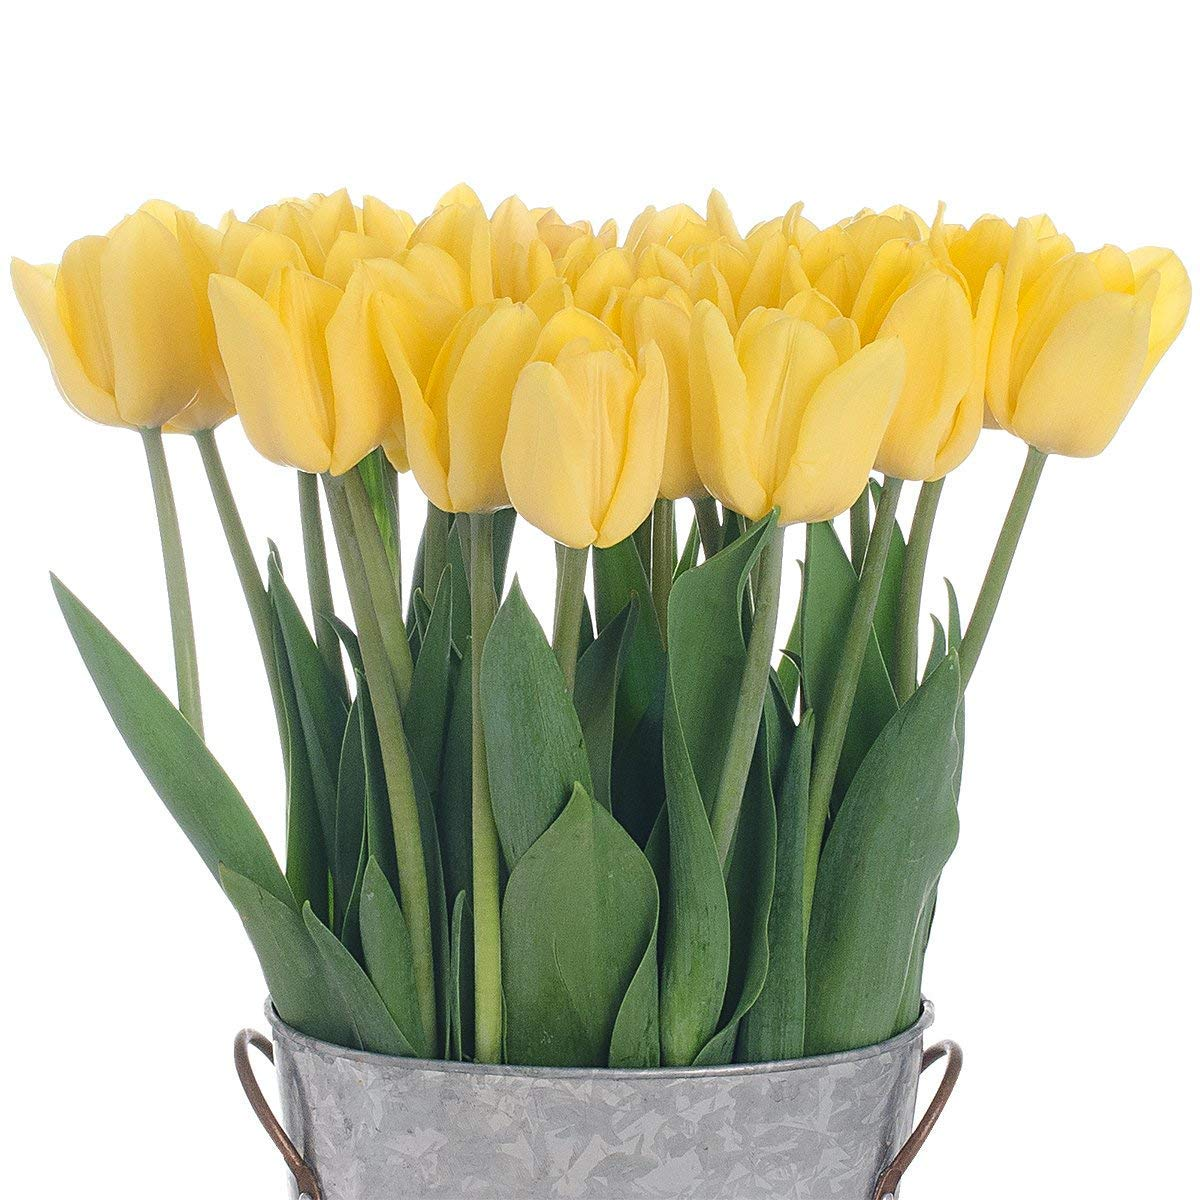 Stargazer Barn -2 Dozen Yellow Tulips with French Bucket Style Vase - Farm Fresh by Stargazer Barn